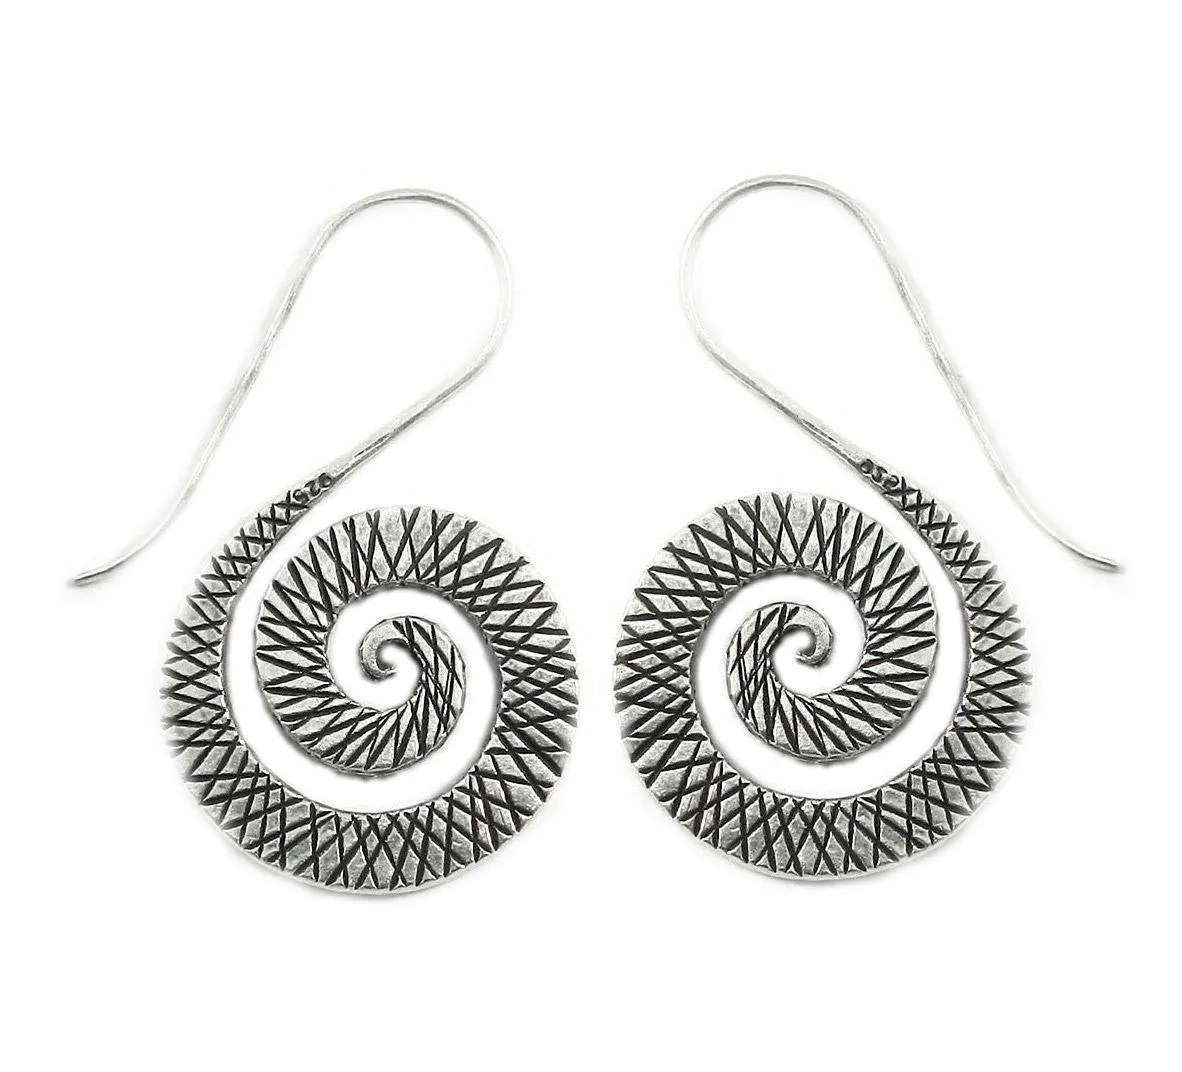 Sterling Silver Spiral Boho Statement Earrings Handmade